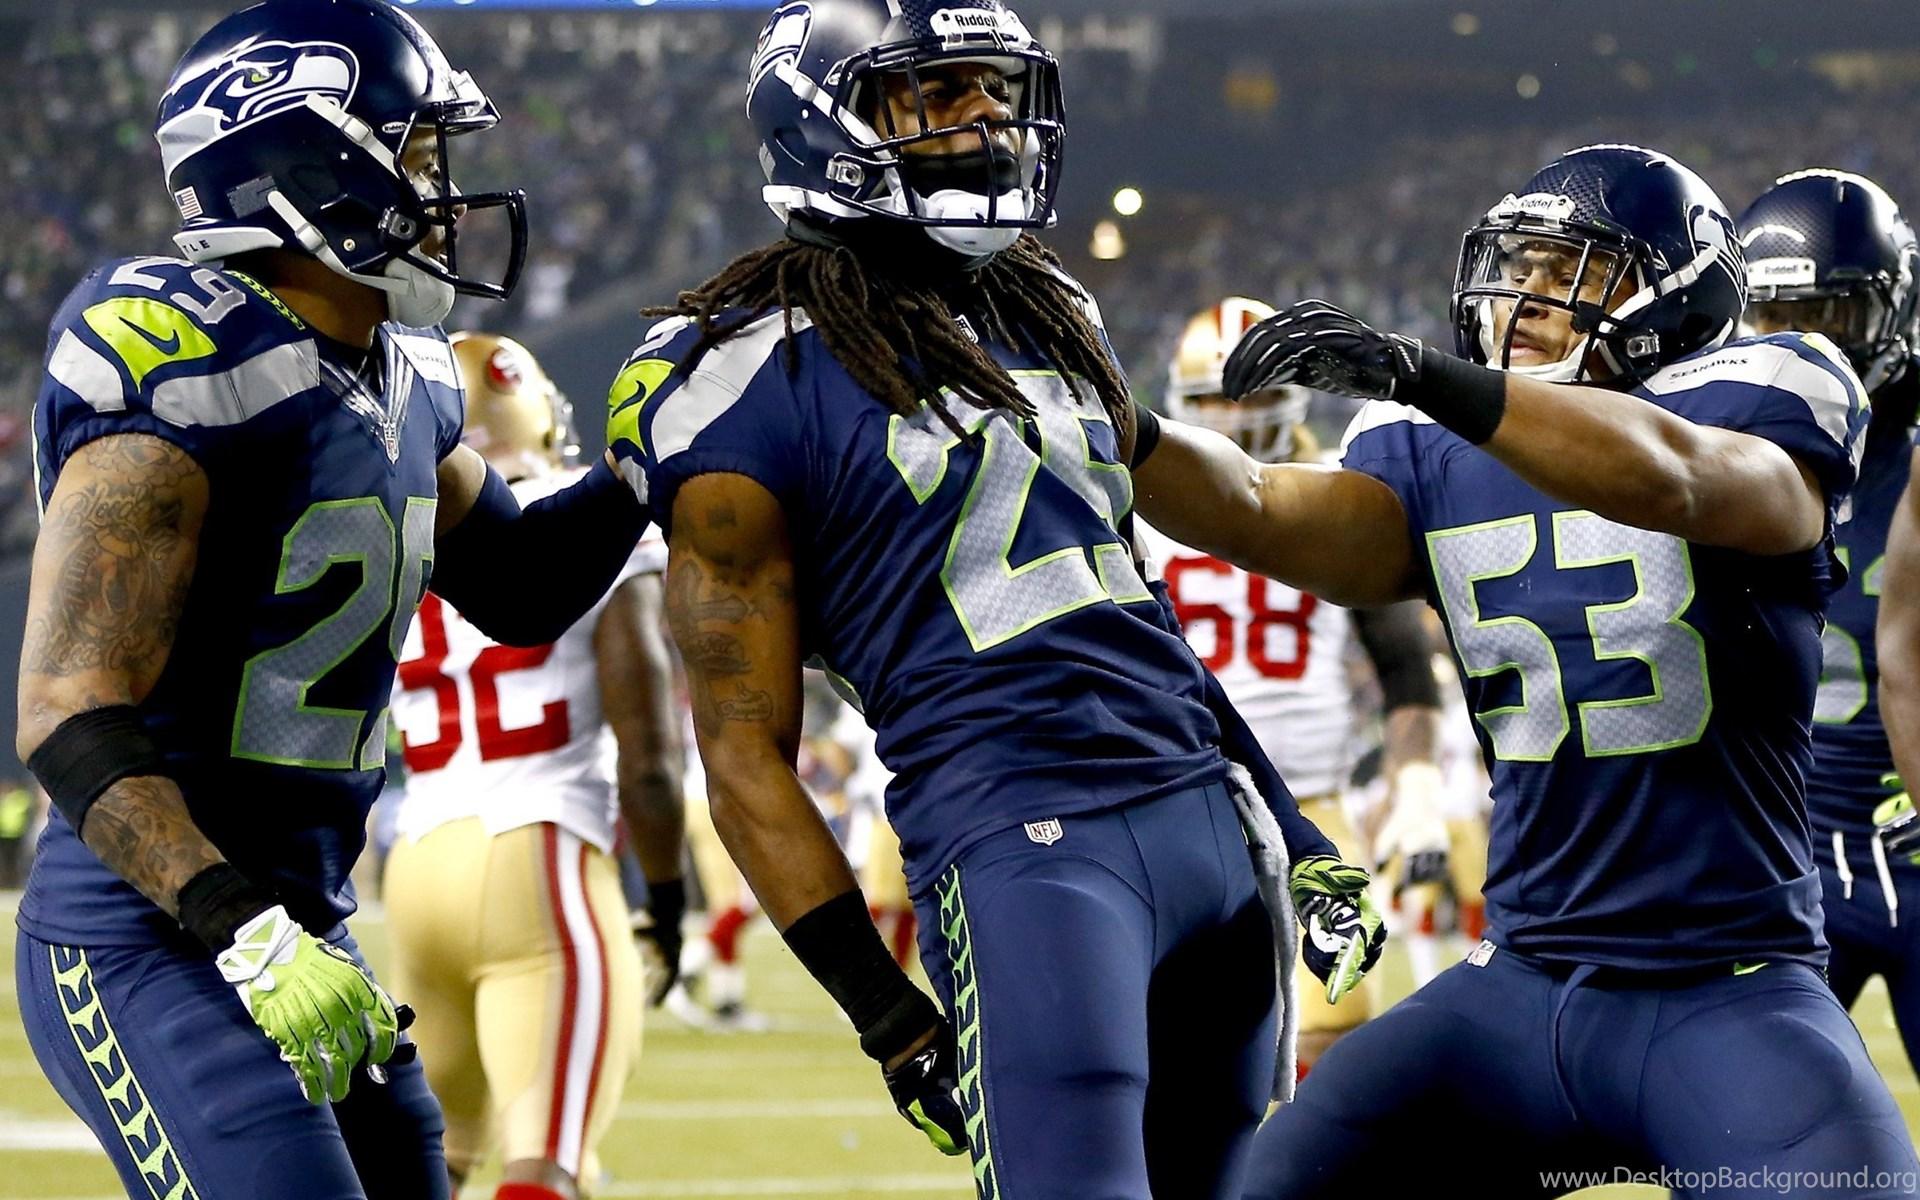 Wallpaper Seahawks American Football Team Match Players Nfl Desktop Background